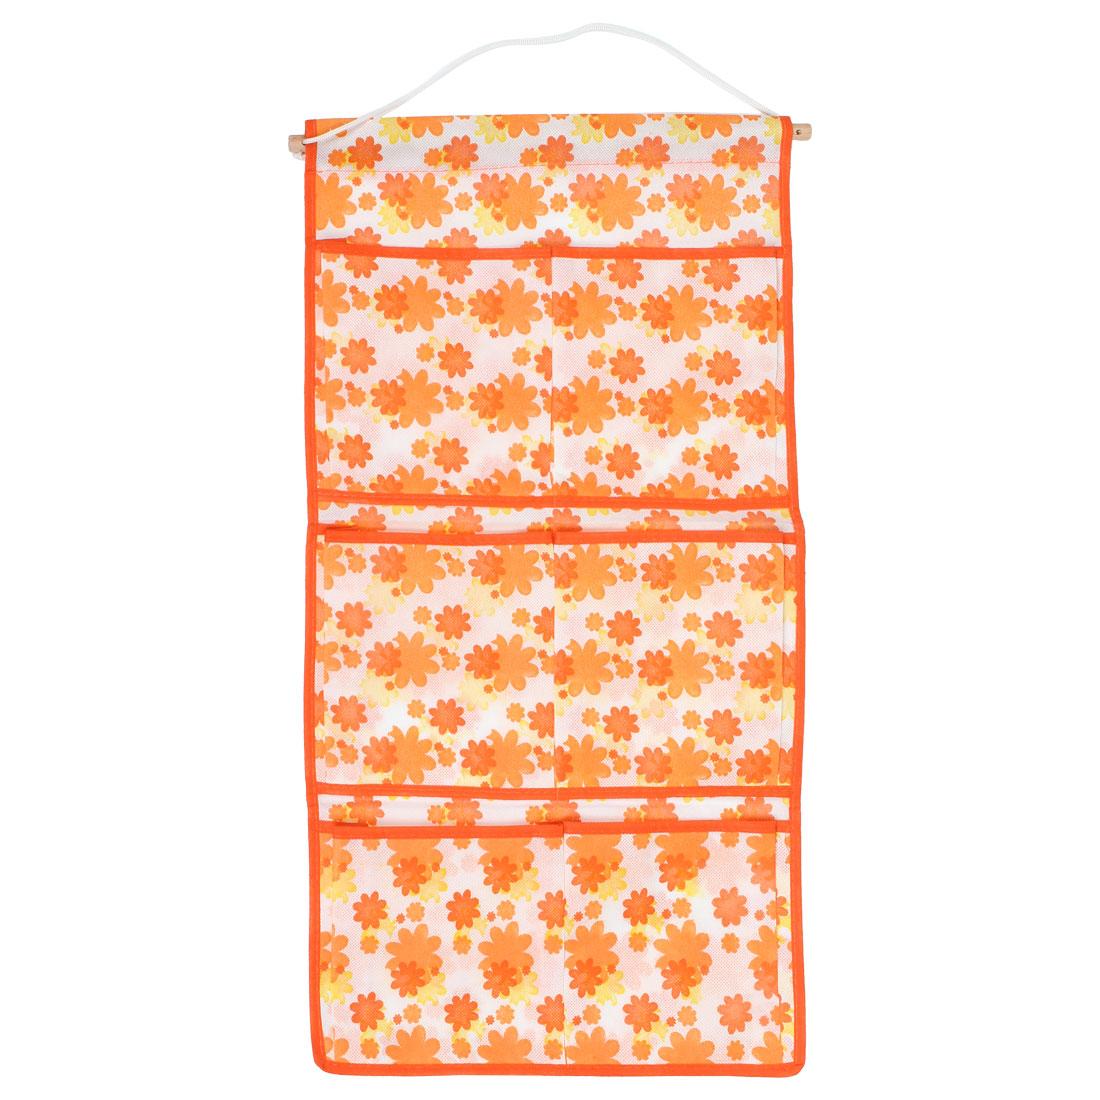 6 Compartment Floral Pattern Orange White Organizer Pocket Bag + Wooden Stick